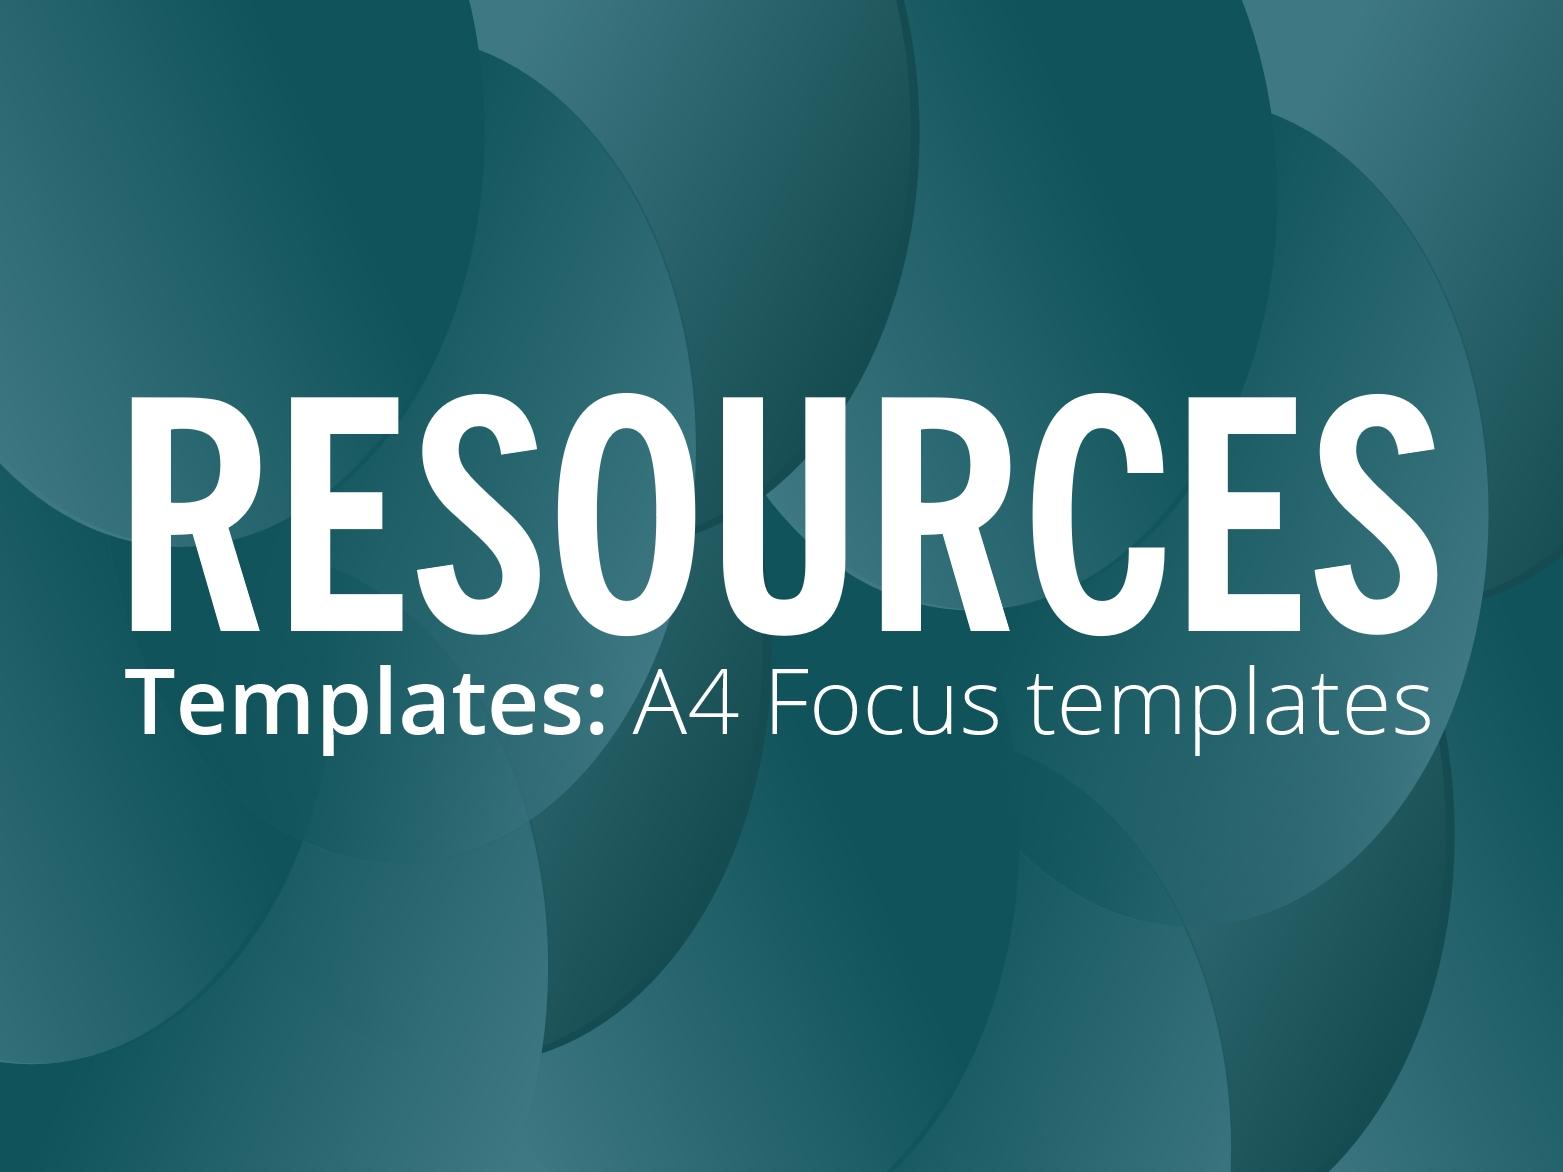 RESOURCES: 2017 A4 Focus templates